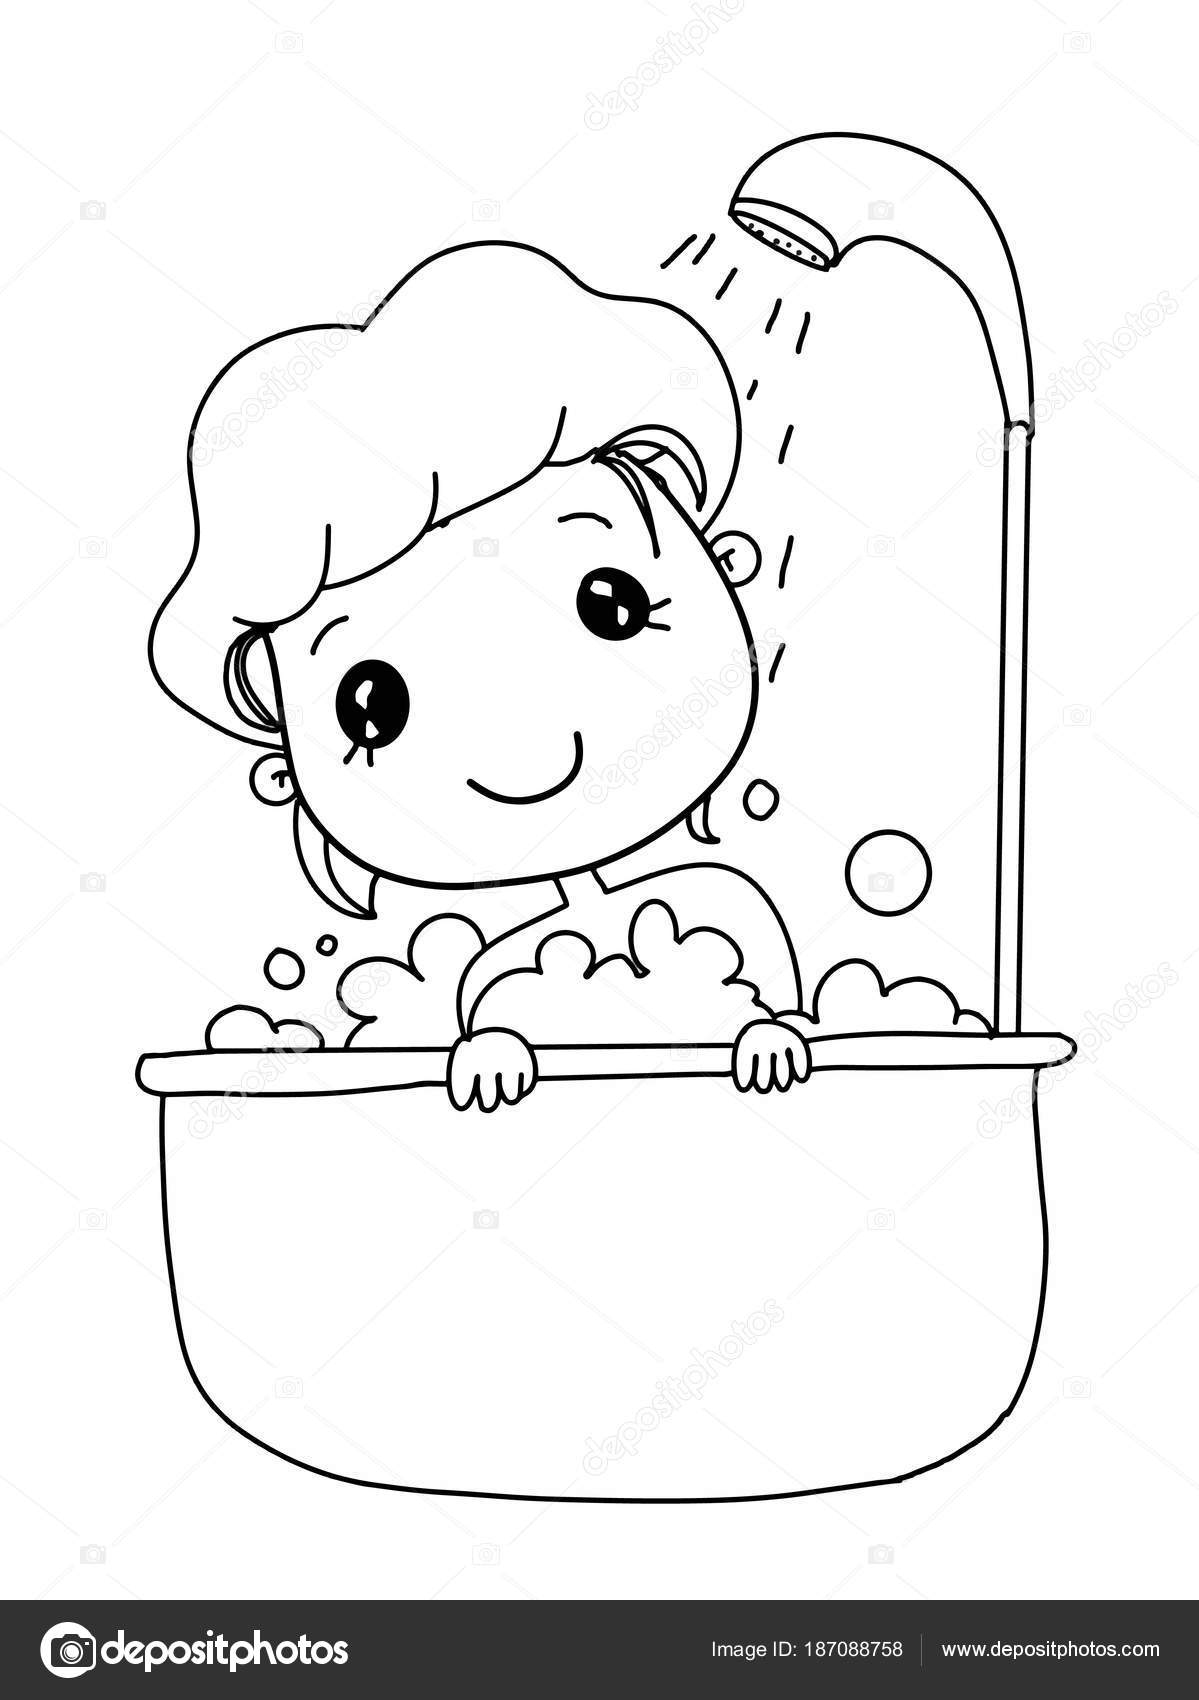 Bañarse Dibujo Infantil Chica Niño Dibujos Animados Lindo Bañarse